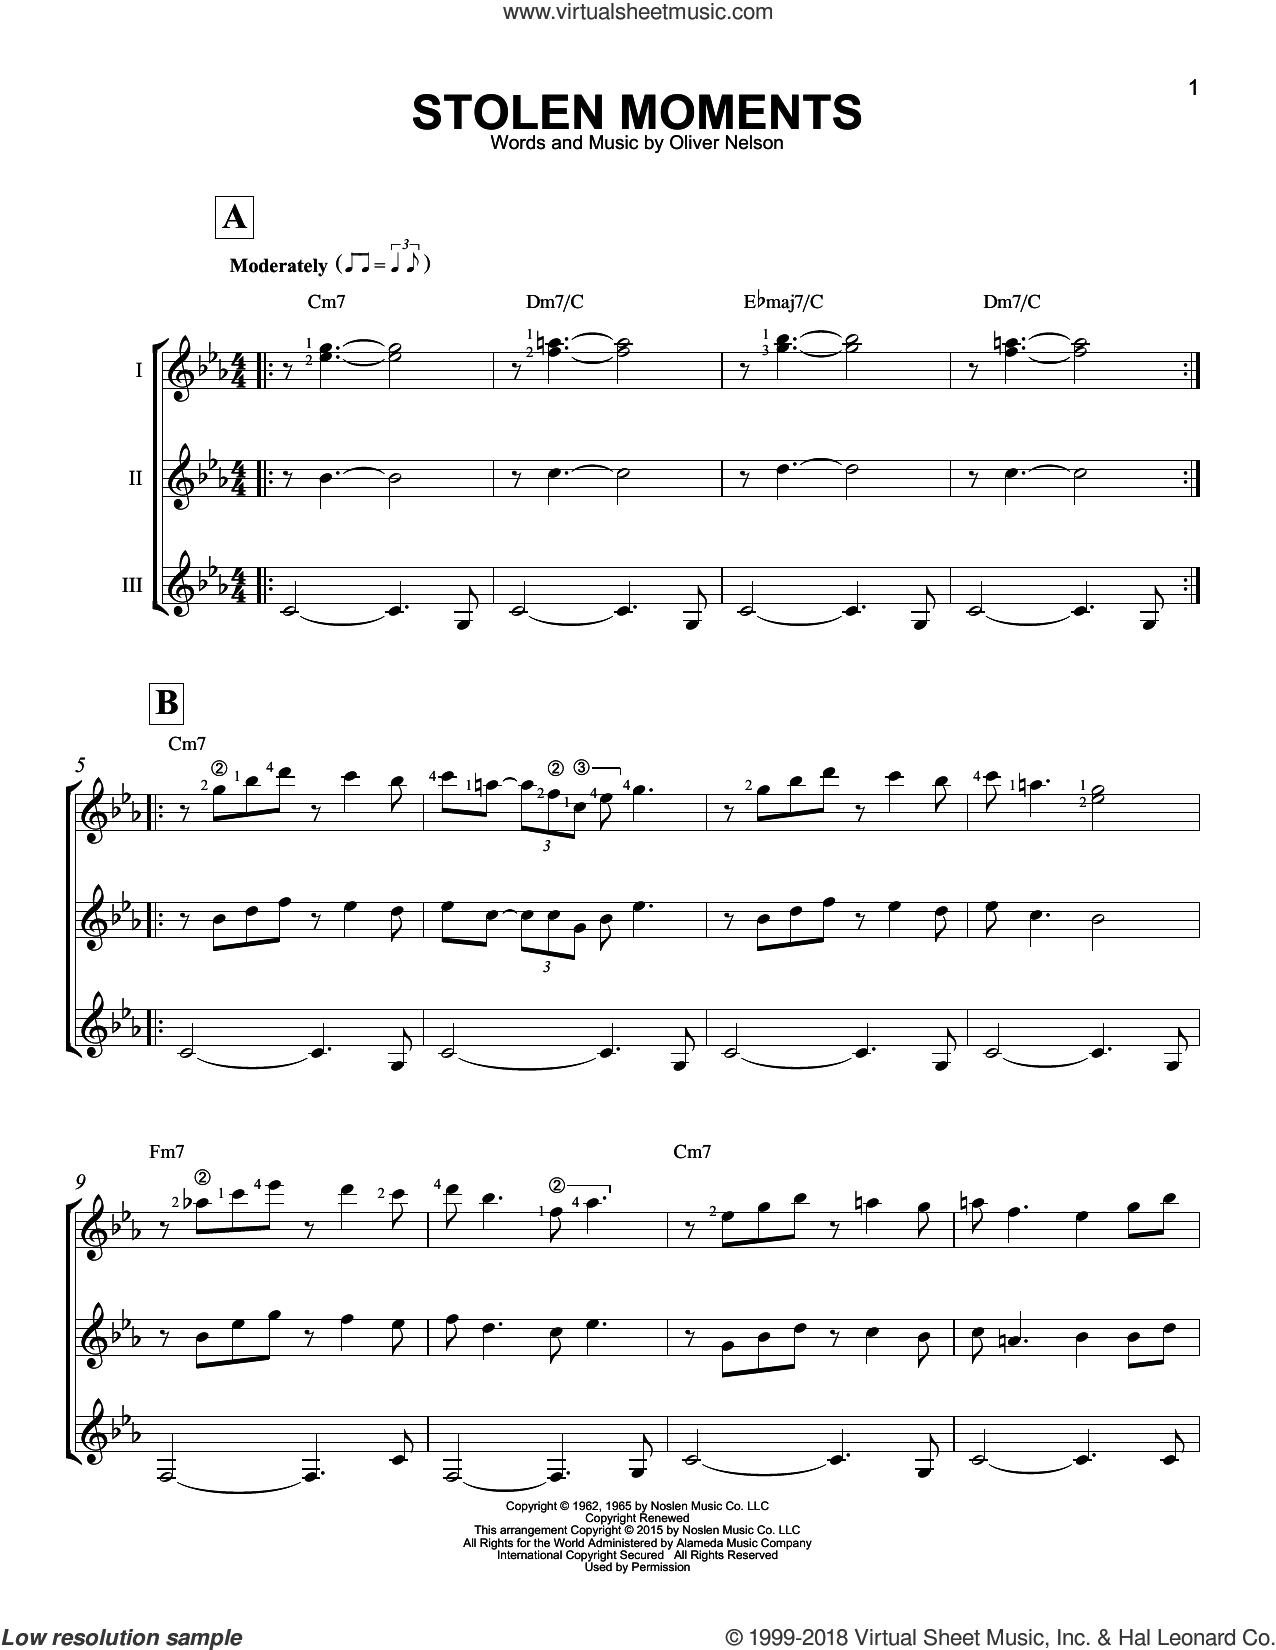 Stolen Moments sheet music for guitar ensemble by Oliver Nelson, intermediate skill level